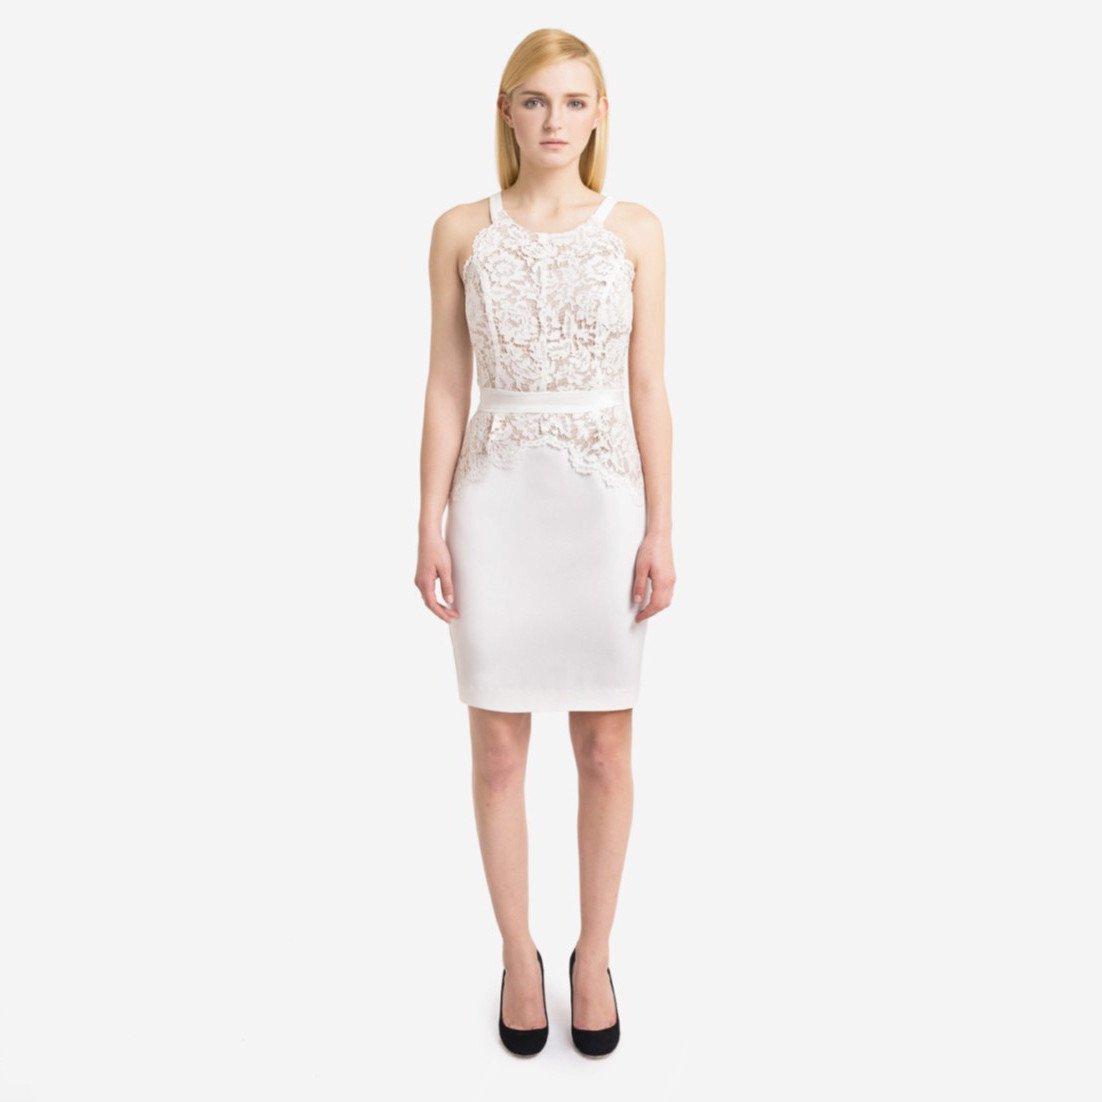 7935e4282 Drifter Lace Pencil Dress